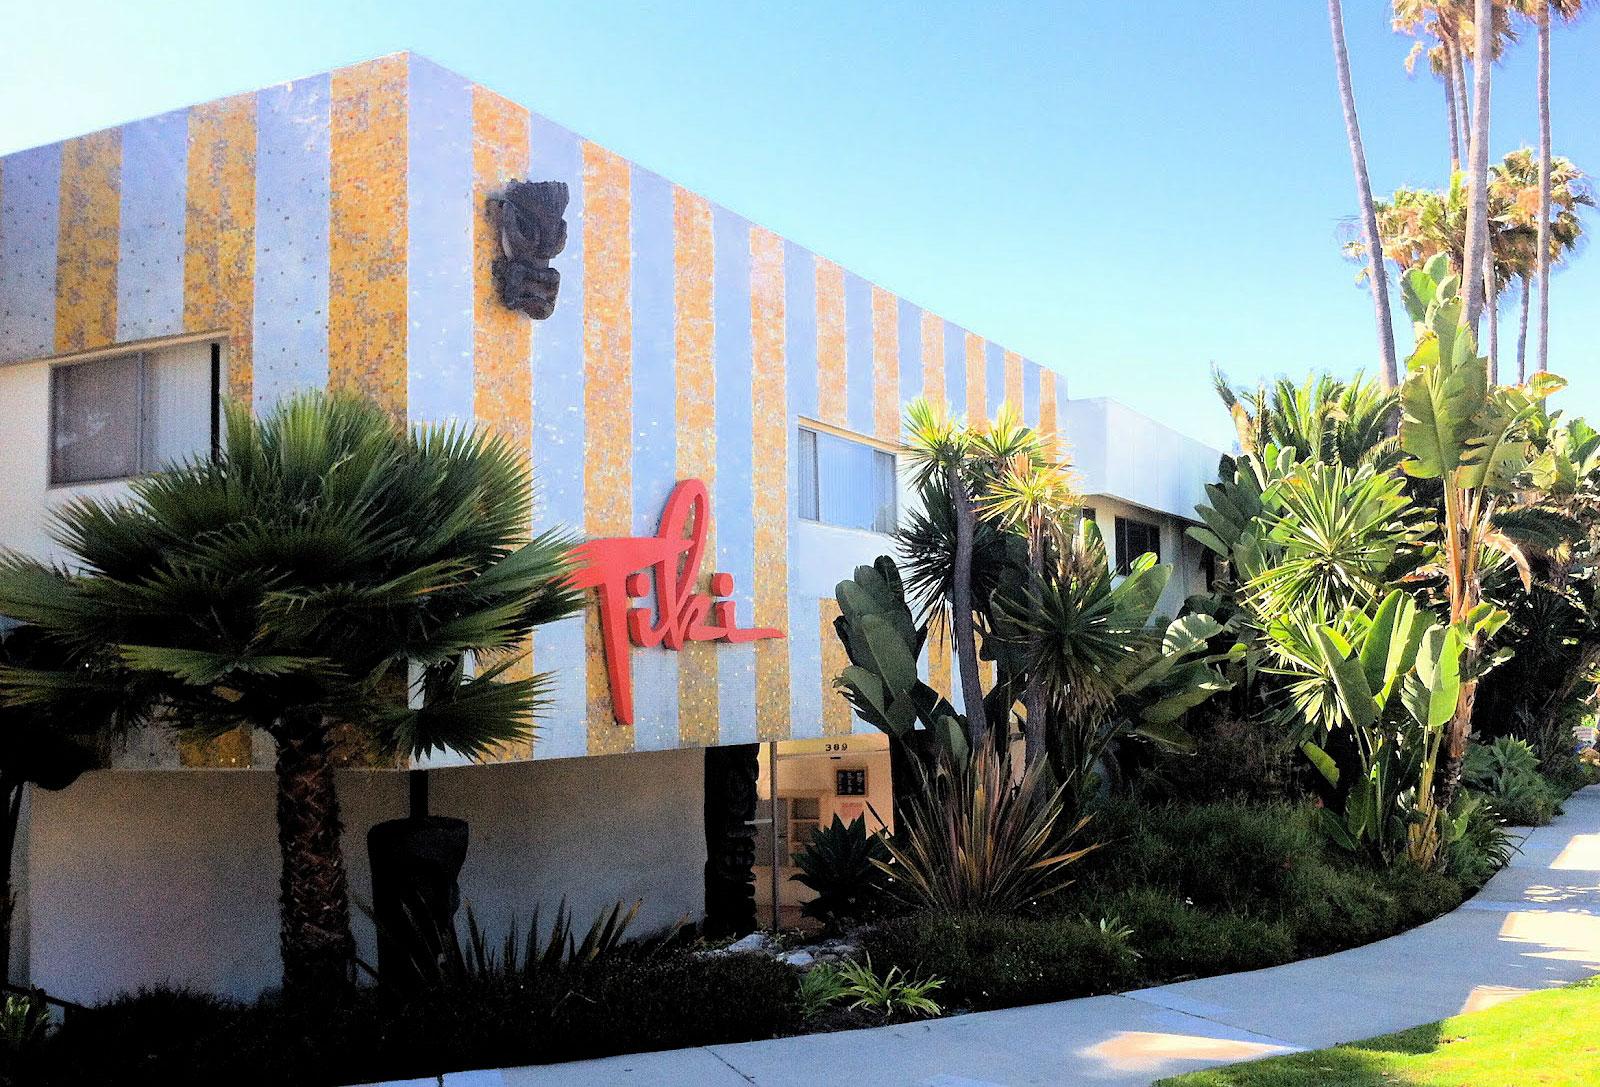 South Redondo Beach Apartments